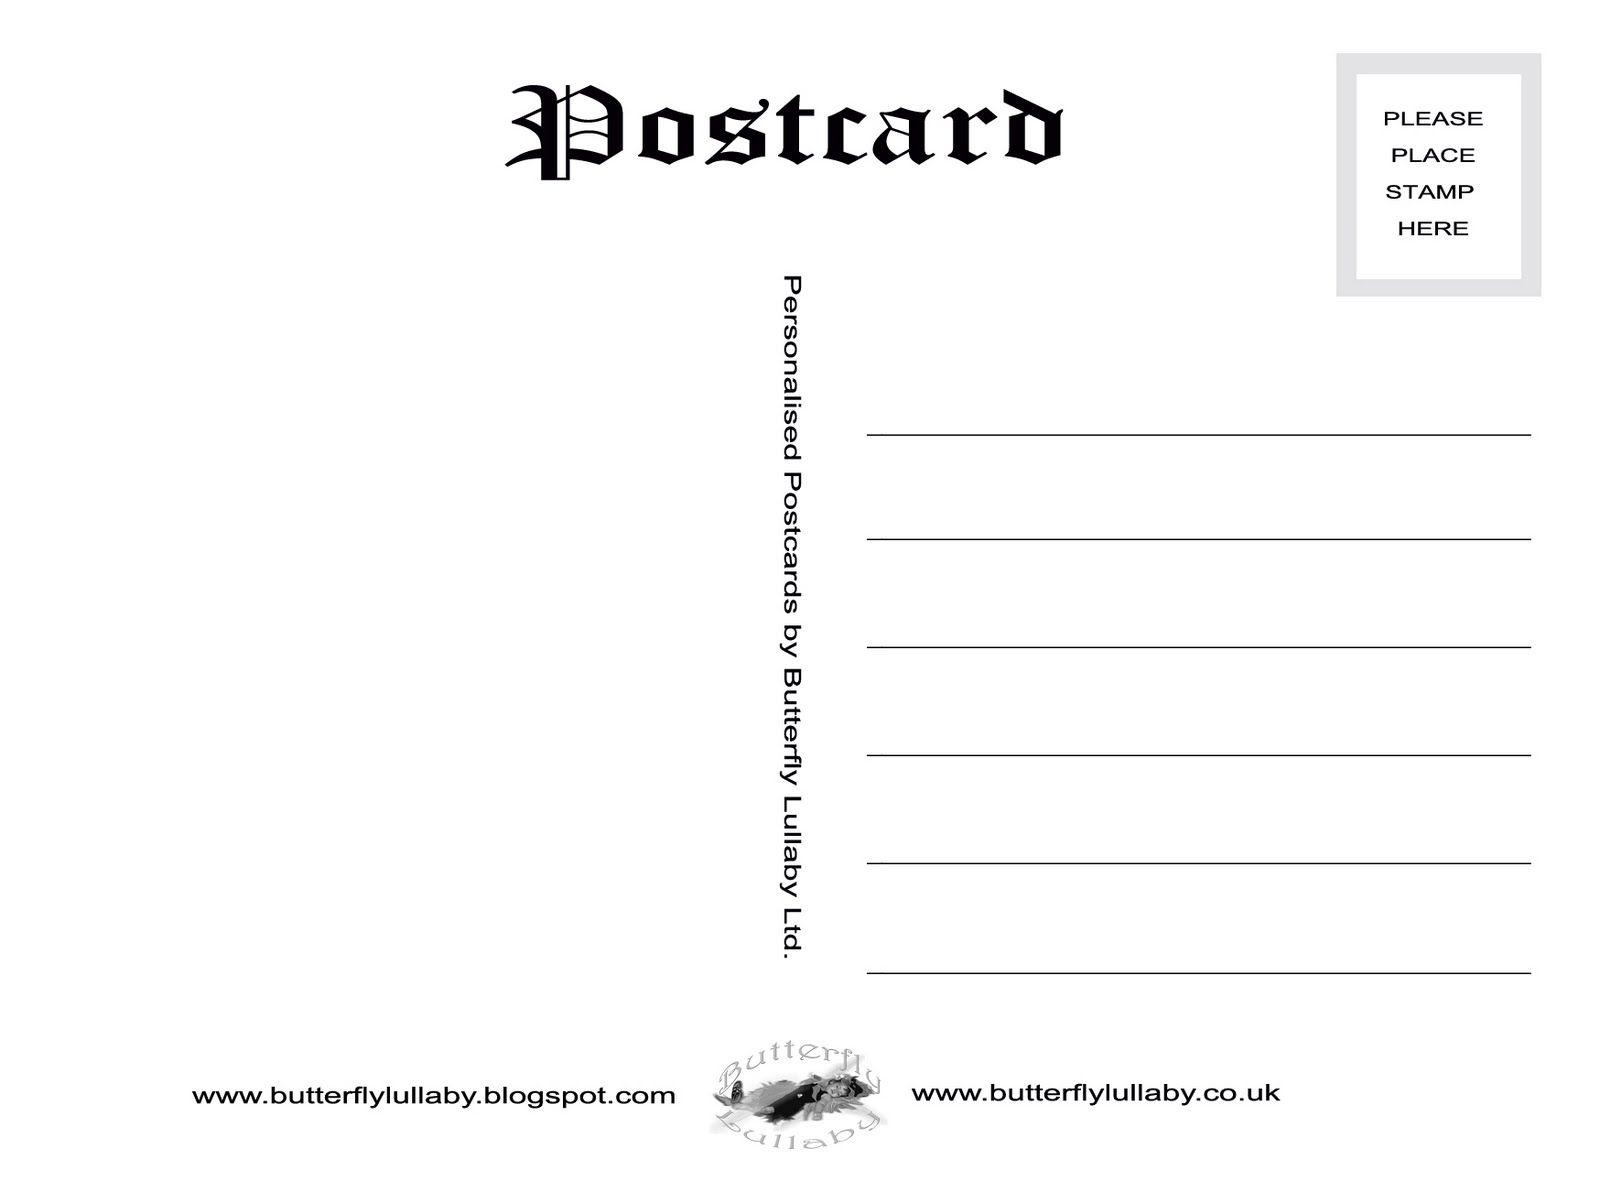 Free Vintage Postcard Templates | Free Postcard Back Template ...